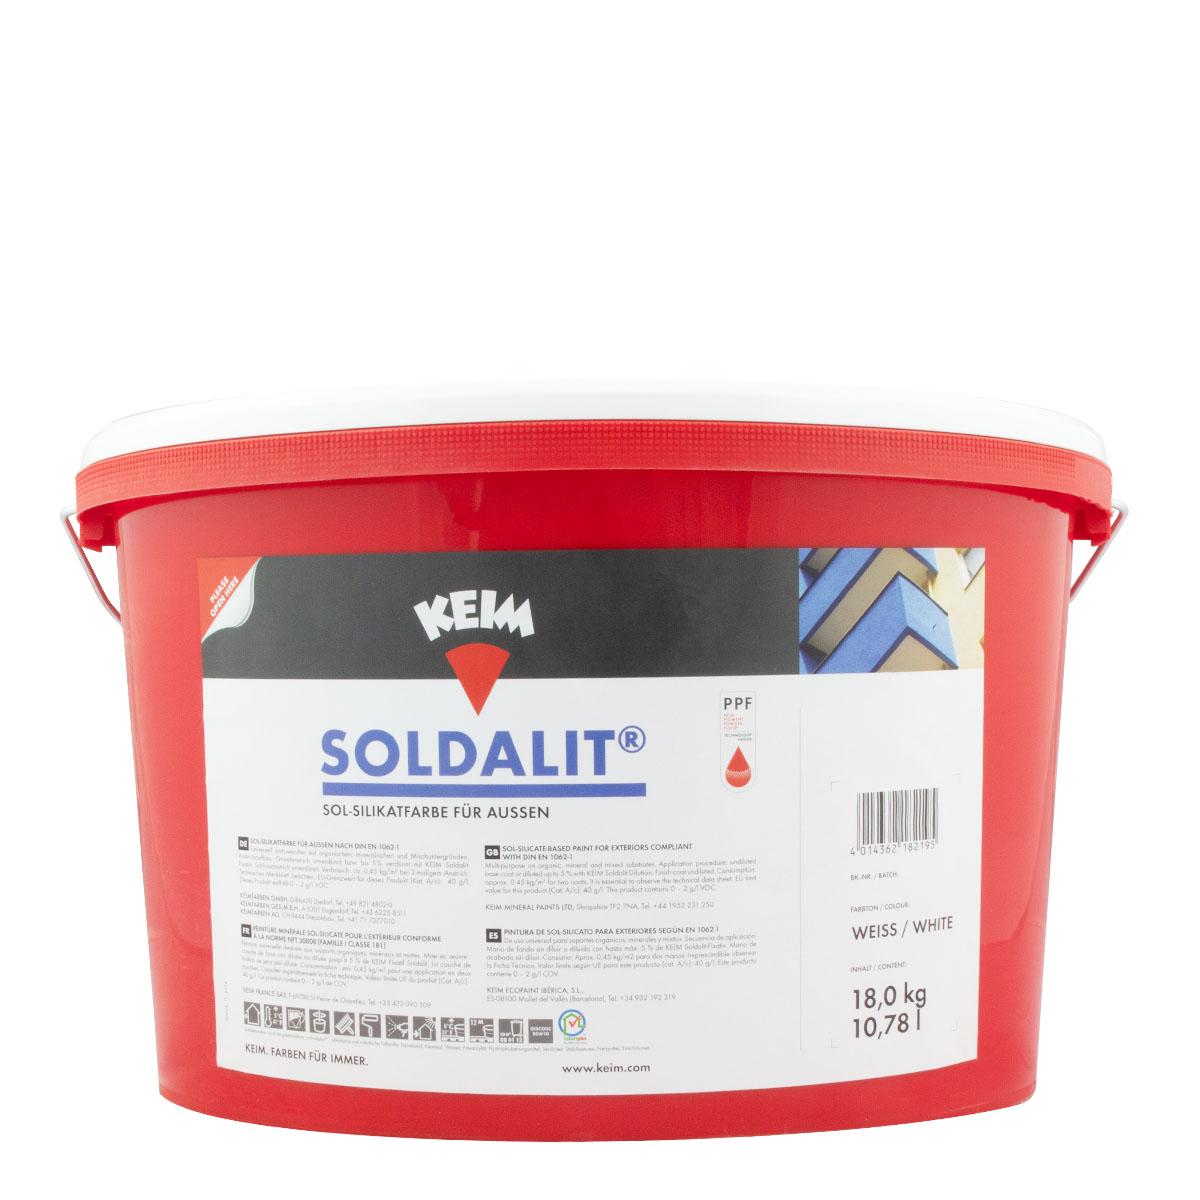 Keim Soldalit Fassadenfarbe 18kg weiss, silikatbasis